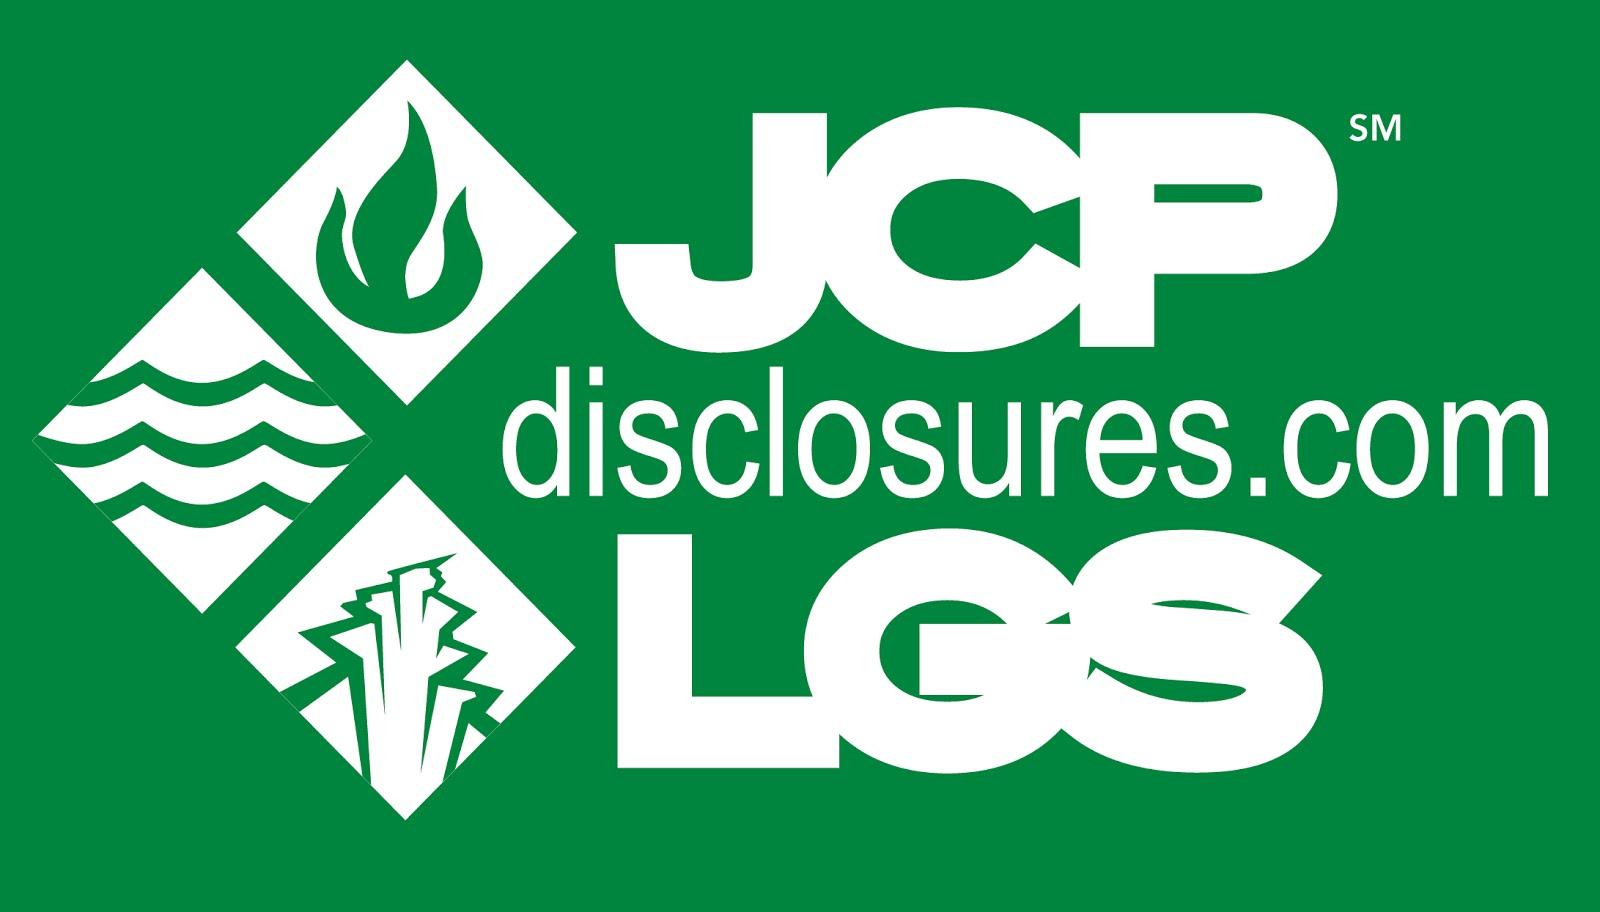 jcp-lgs.jpg